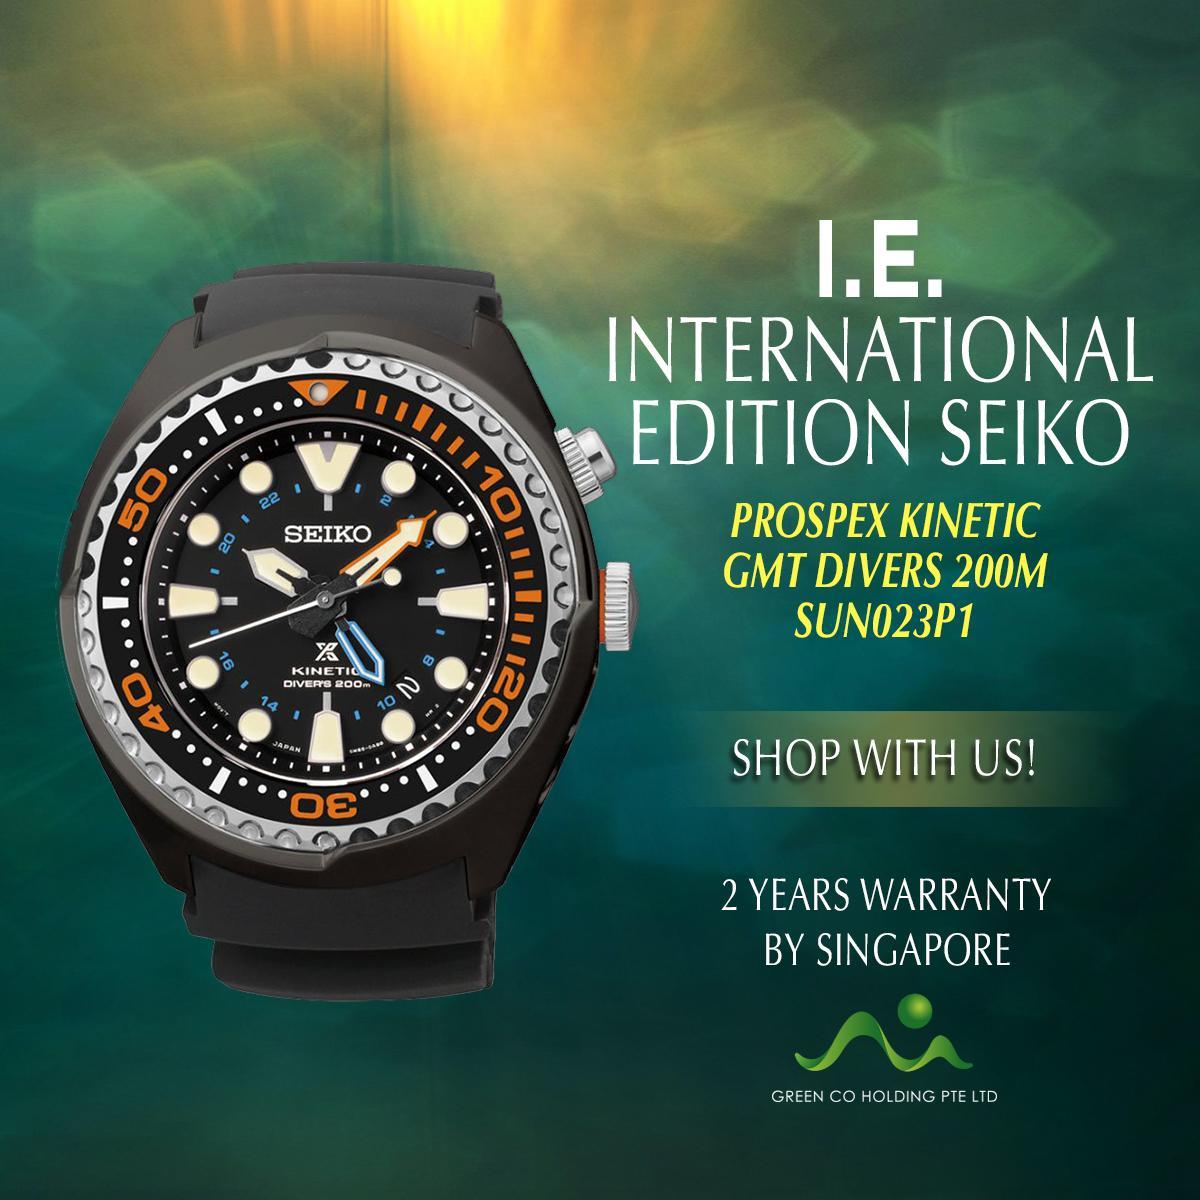 Seiko Prospex Kinetic Diver Price In Singapore